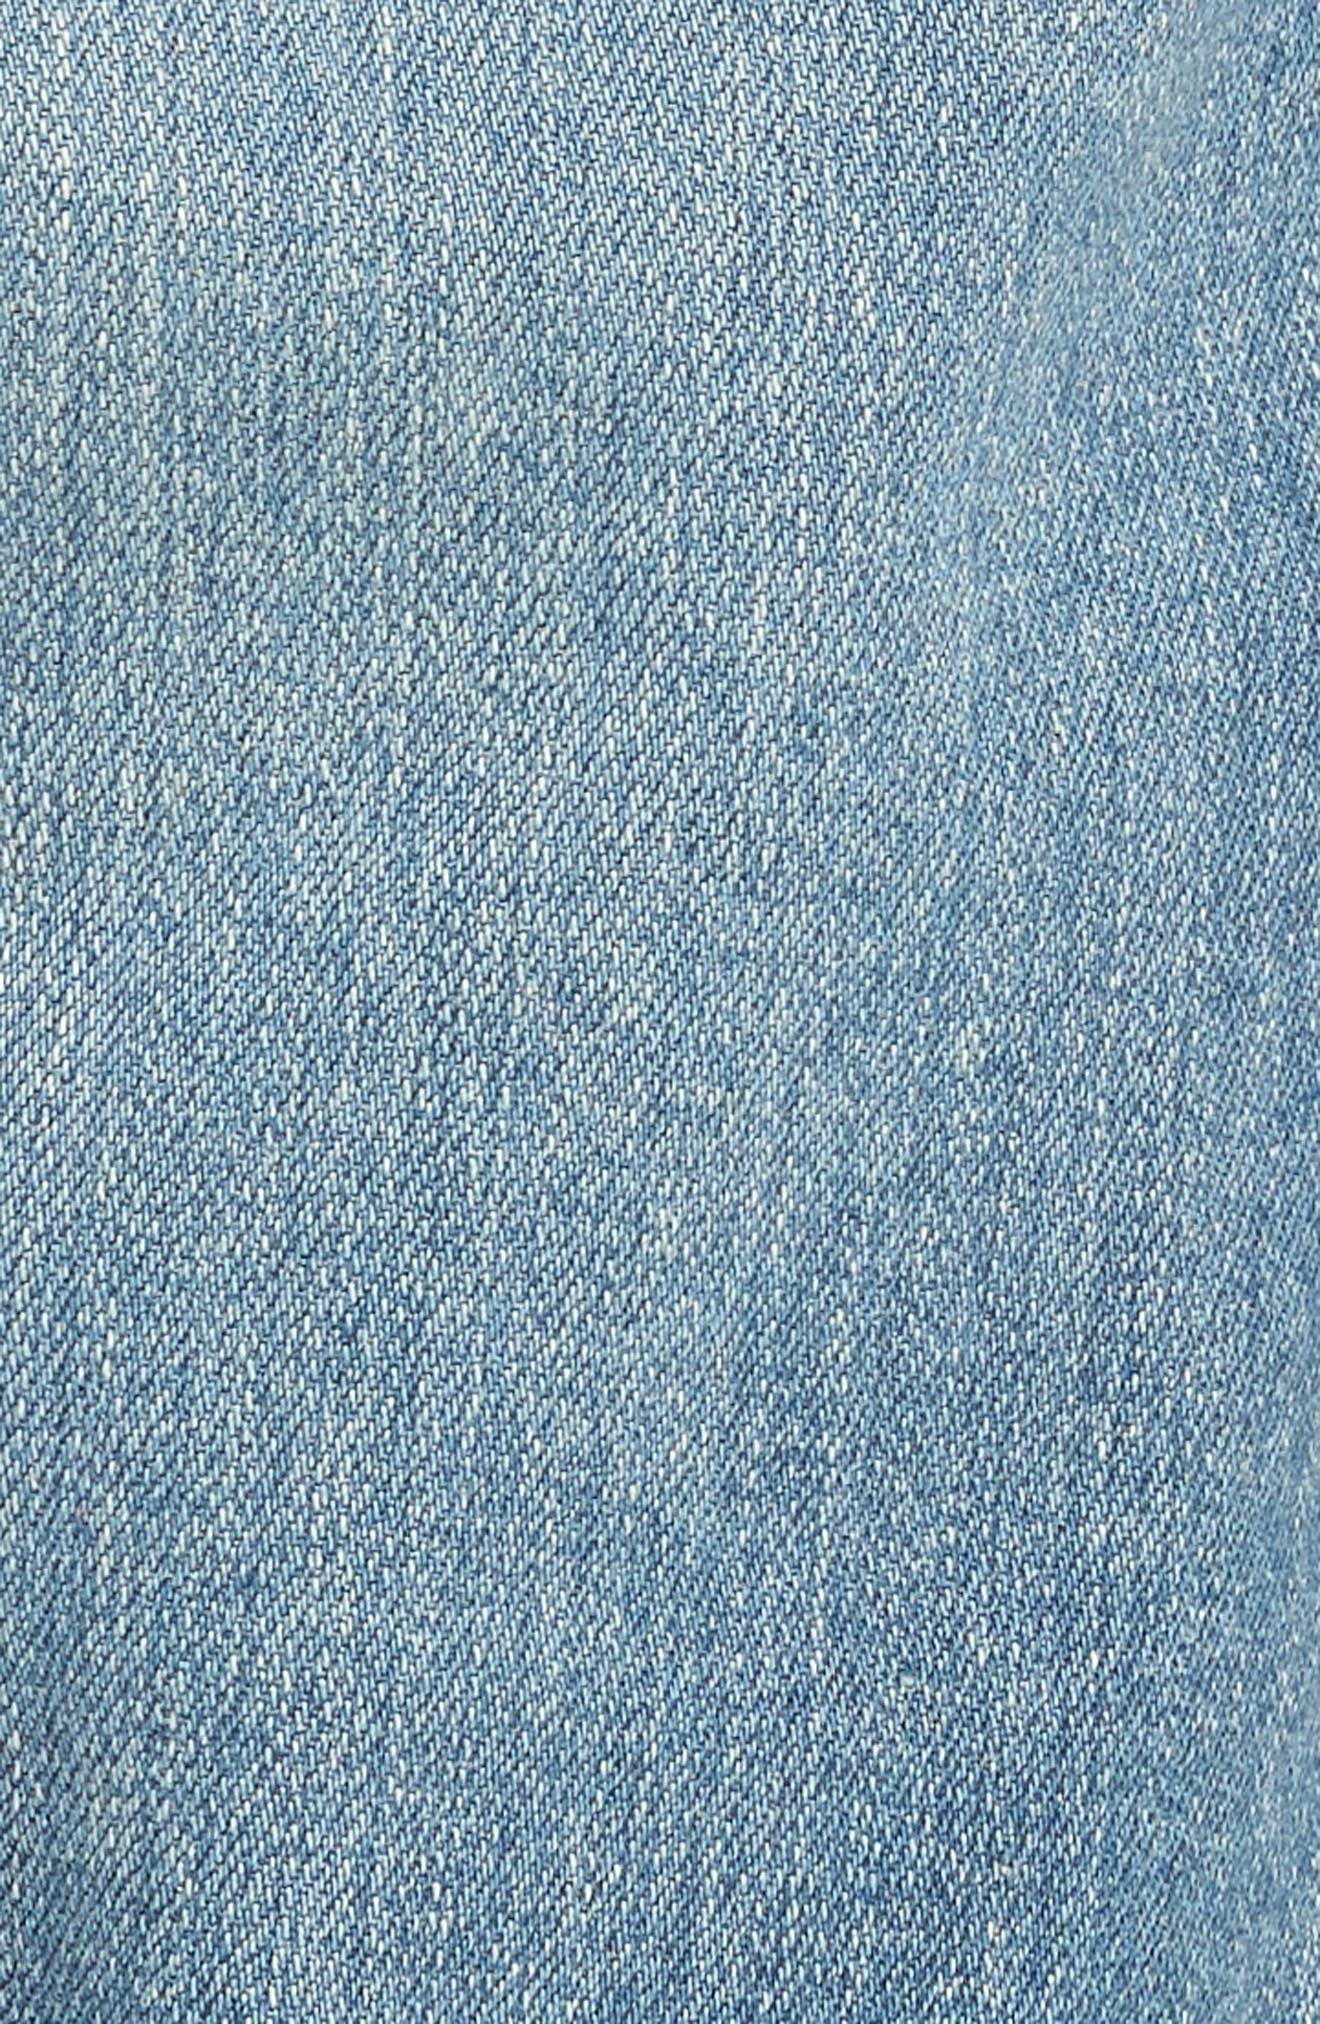 Dylan Skinny Fit Jeans,                             Alternate thumbnail 5, color,                             424